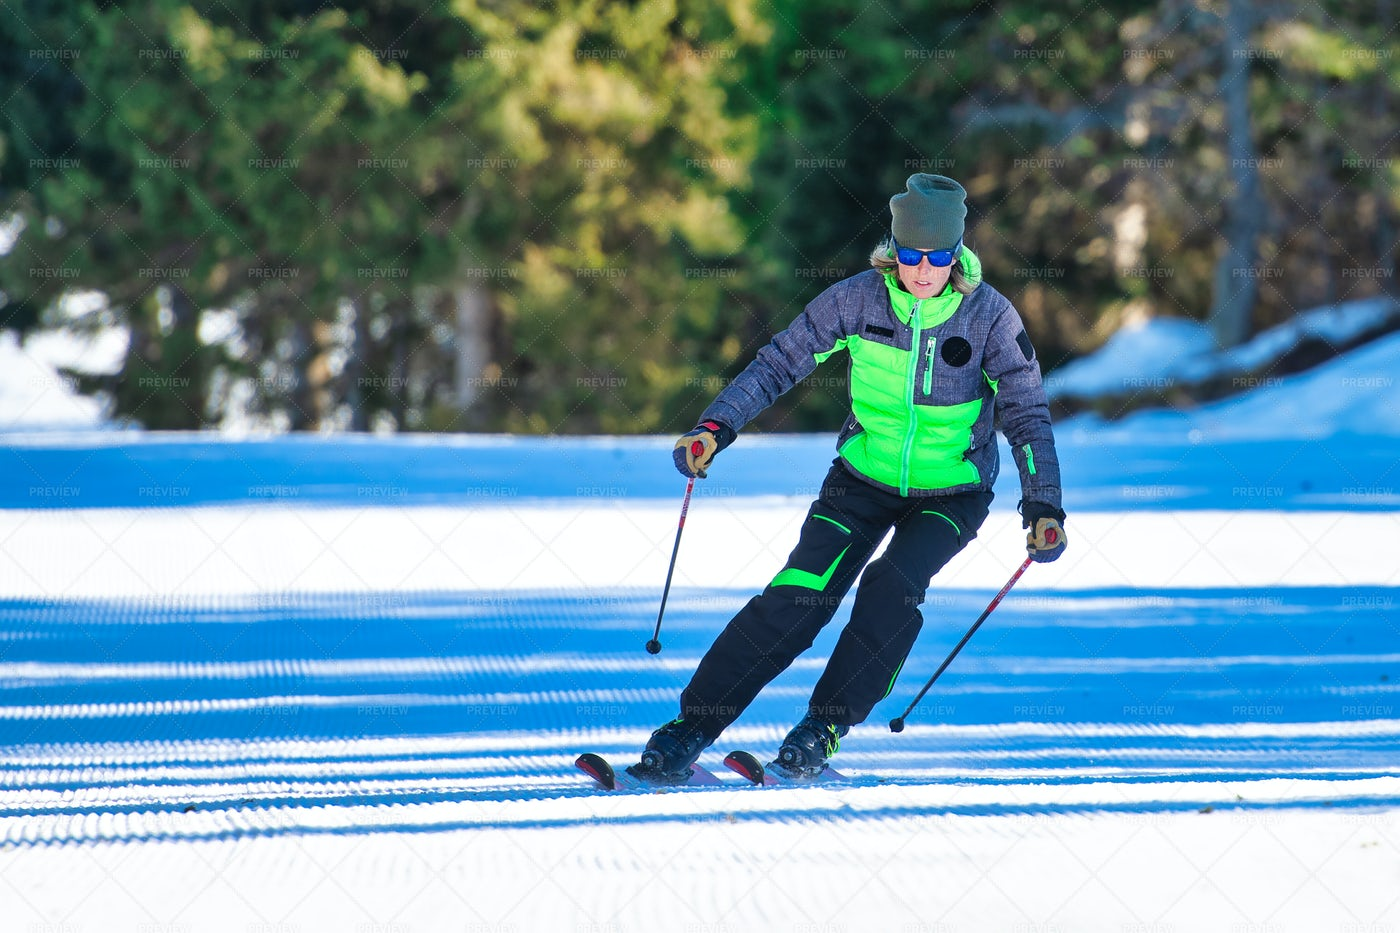 Ski Instructor On Slopes: Stock Photos